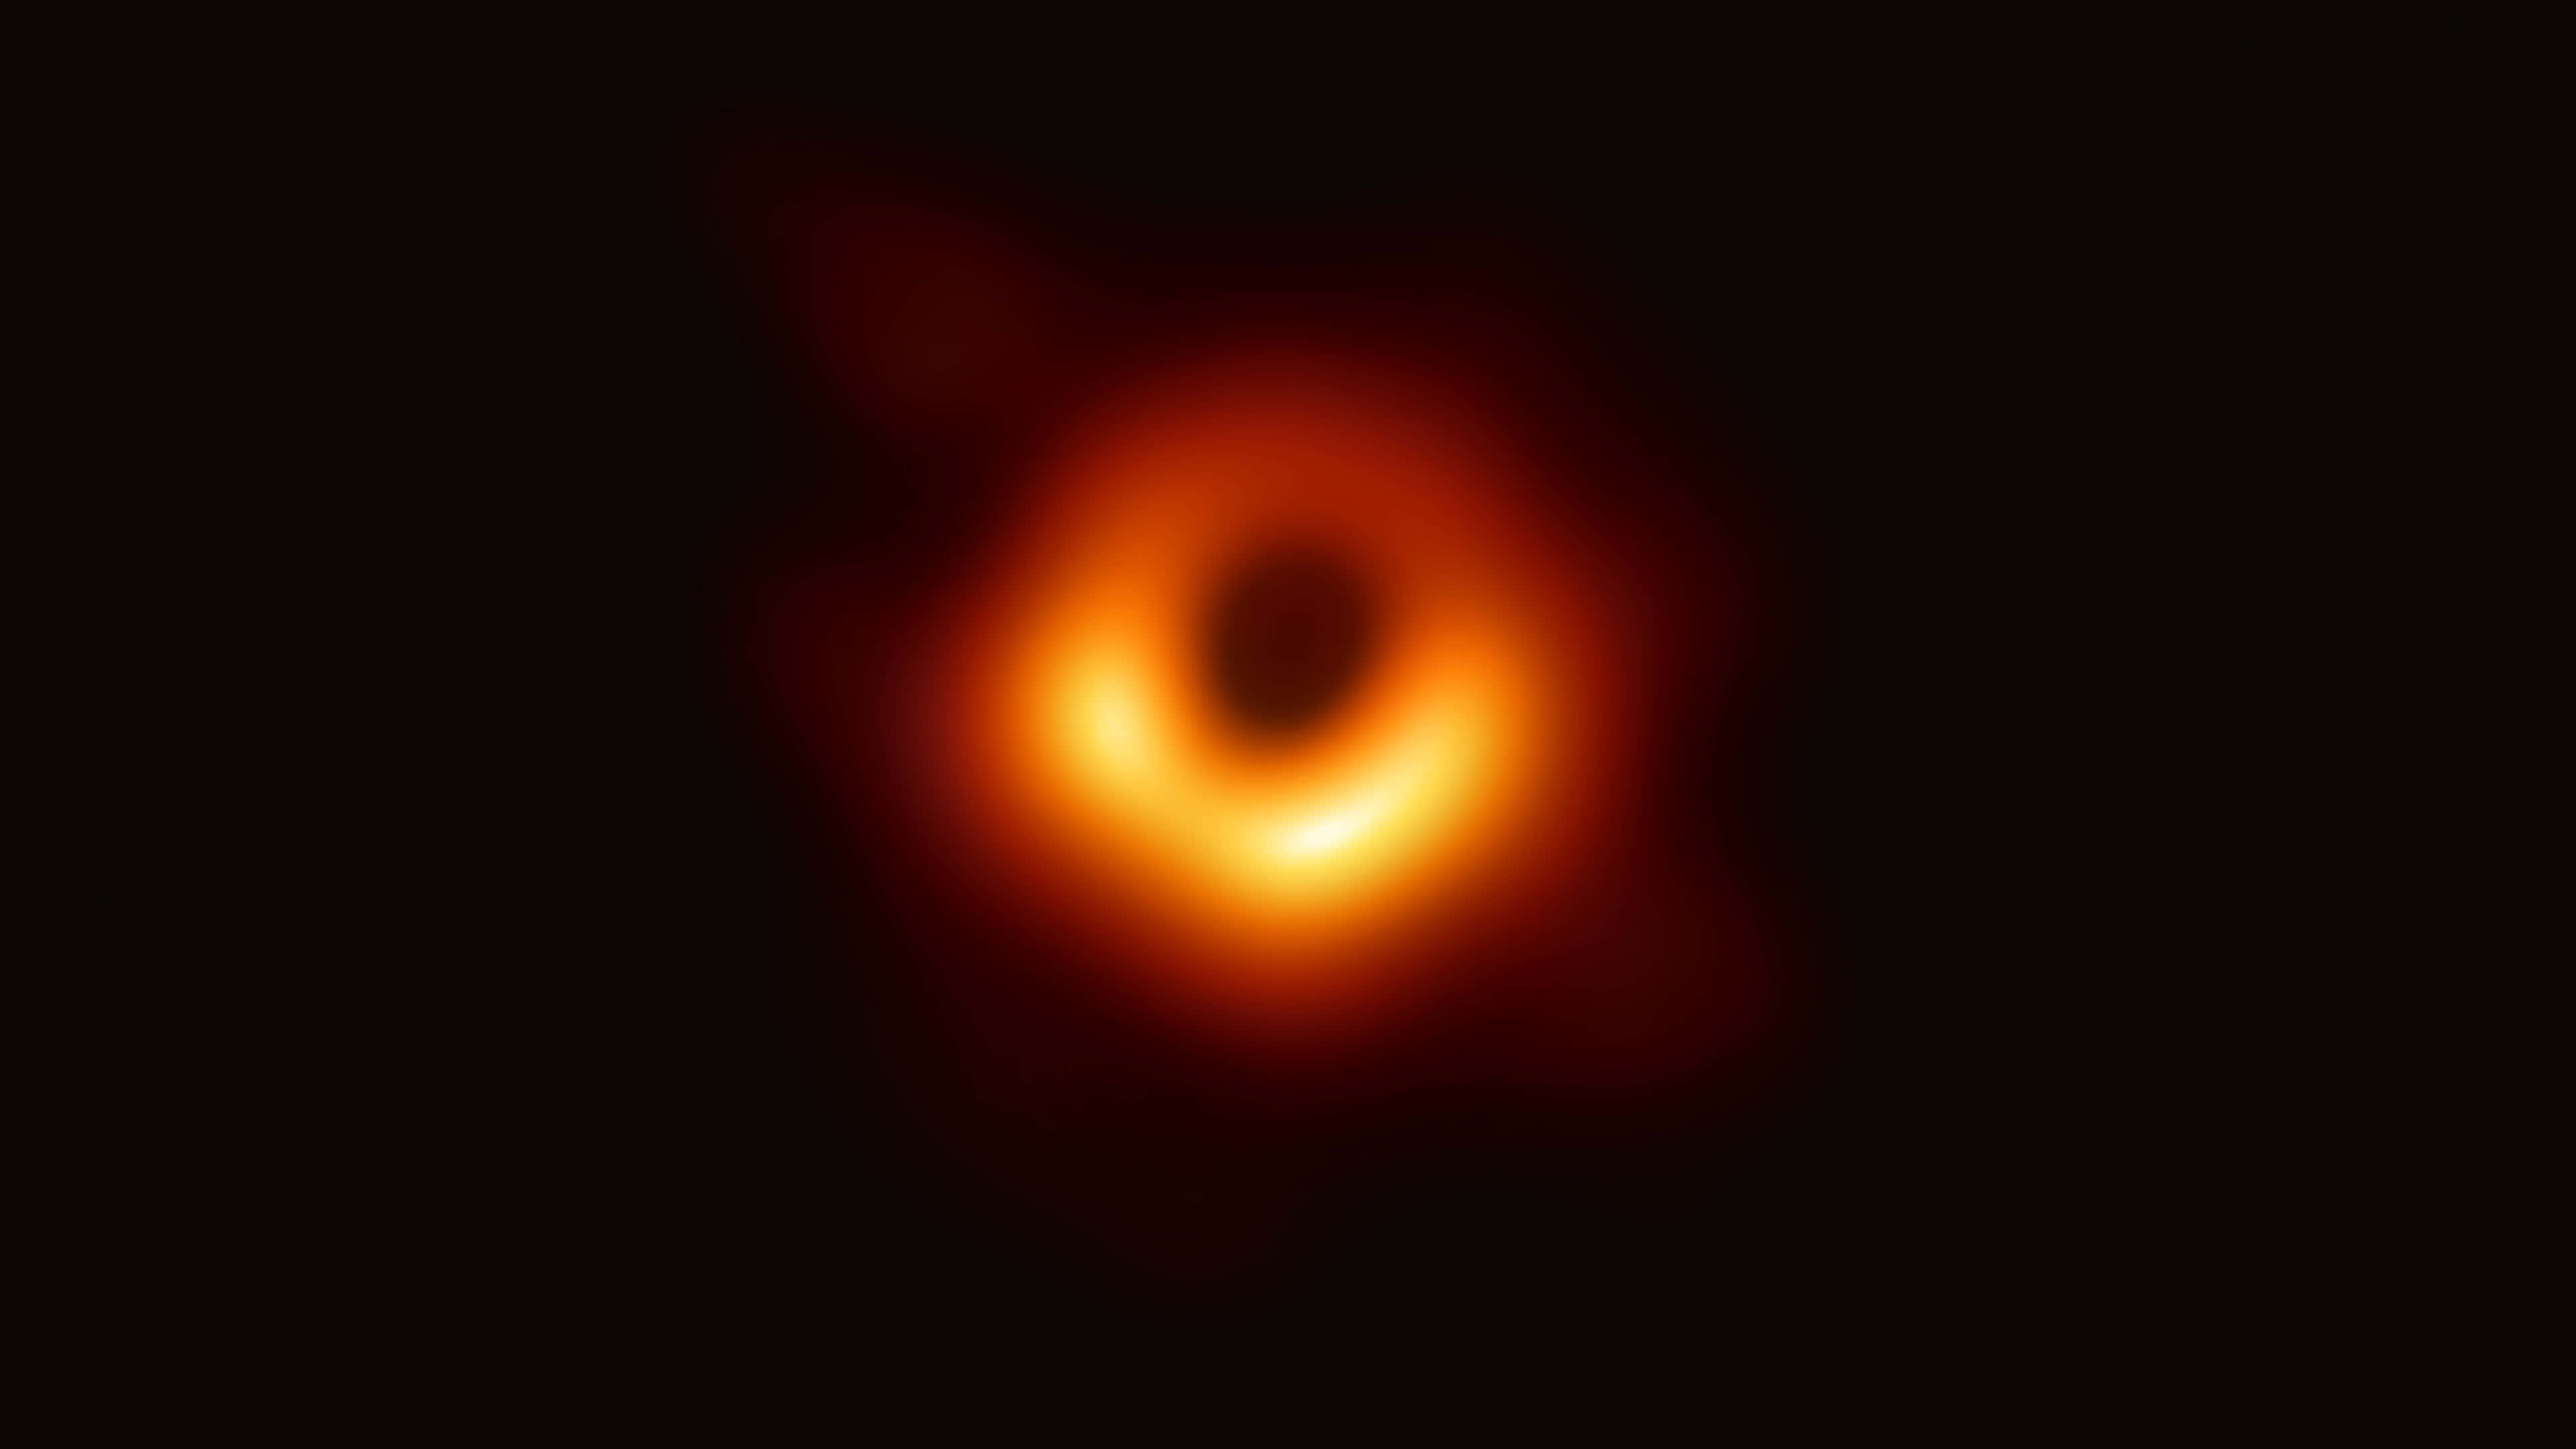 M87 Black Hole UHD 4K Wallpaper Pixelz 3840x2160